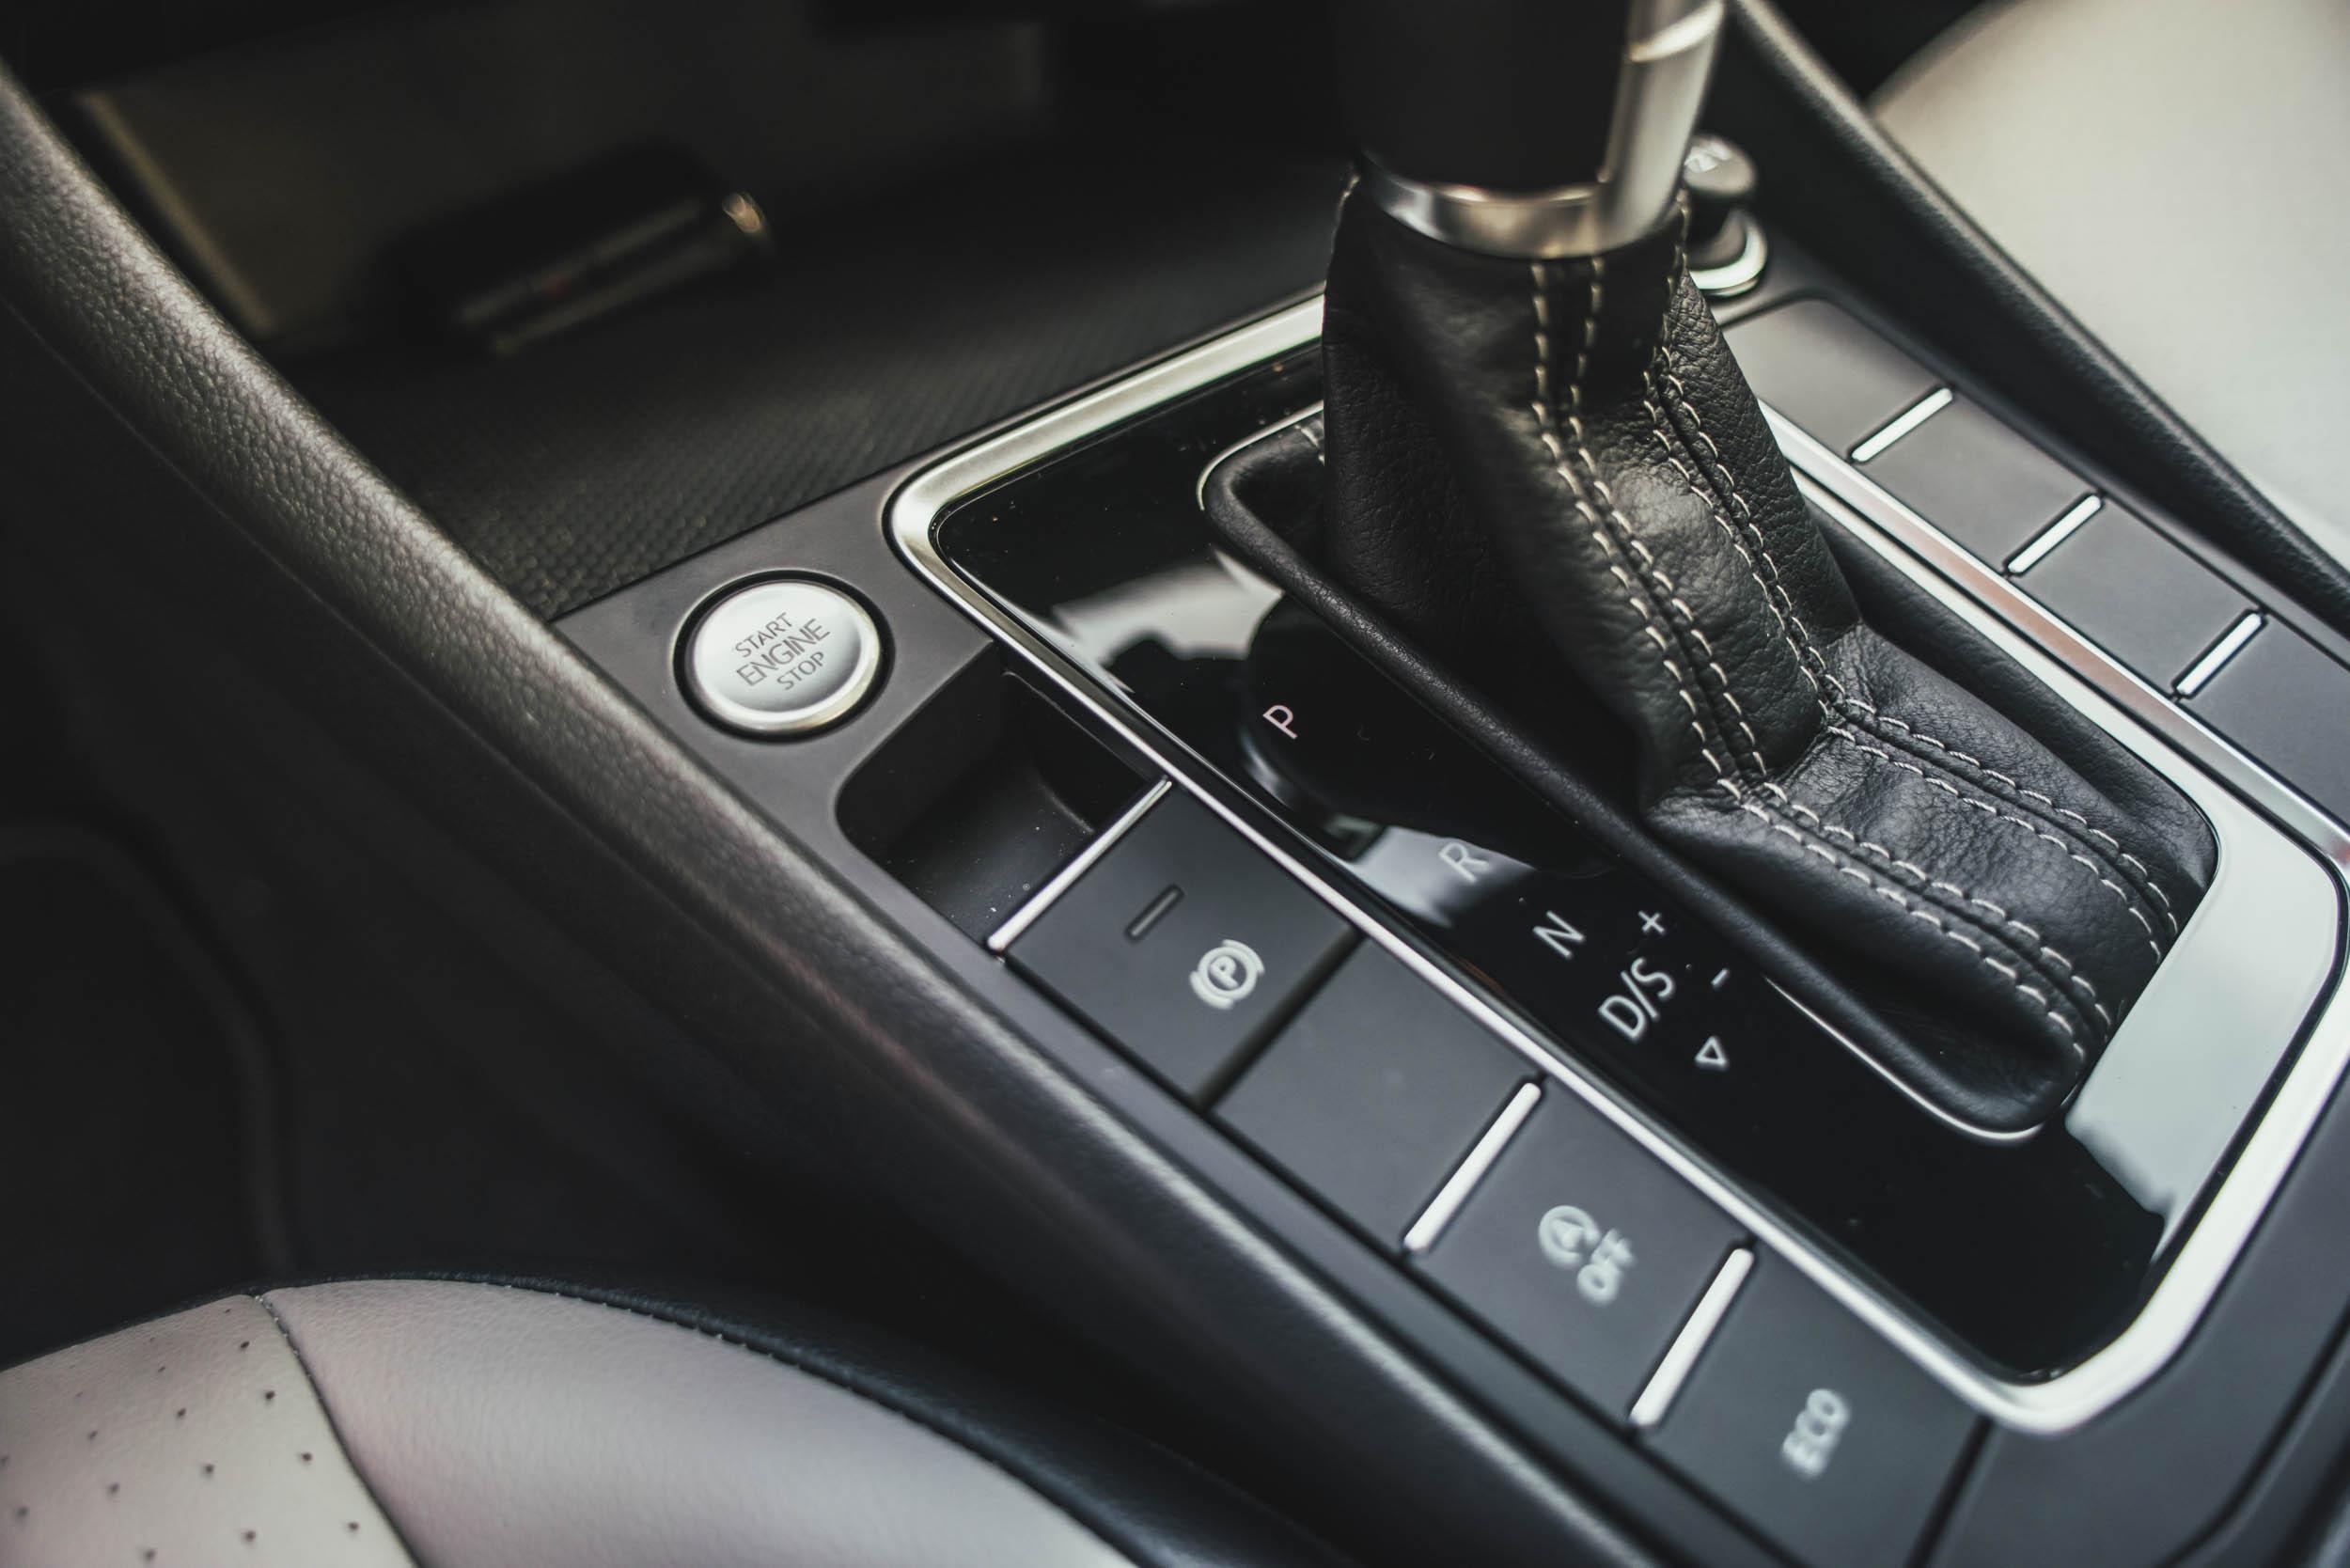 volkswagen jetta r-line close-up on gearshift